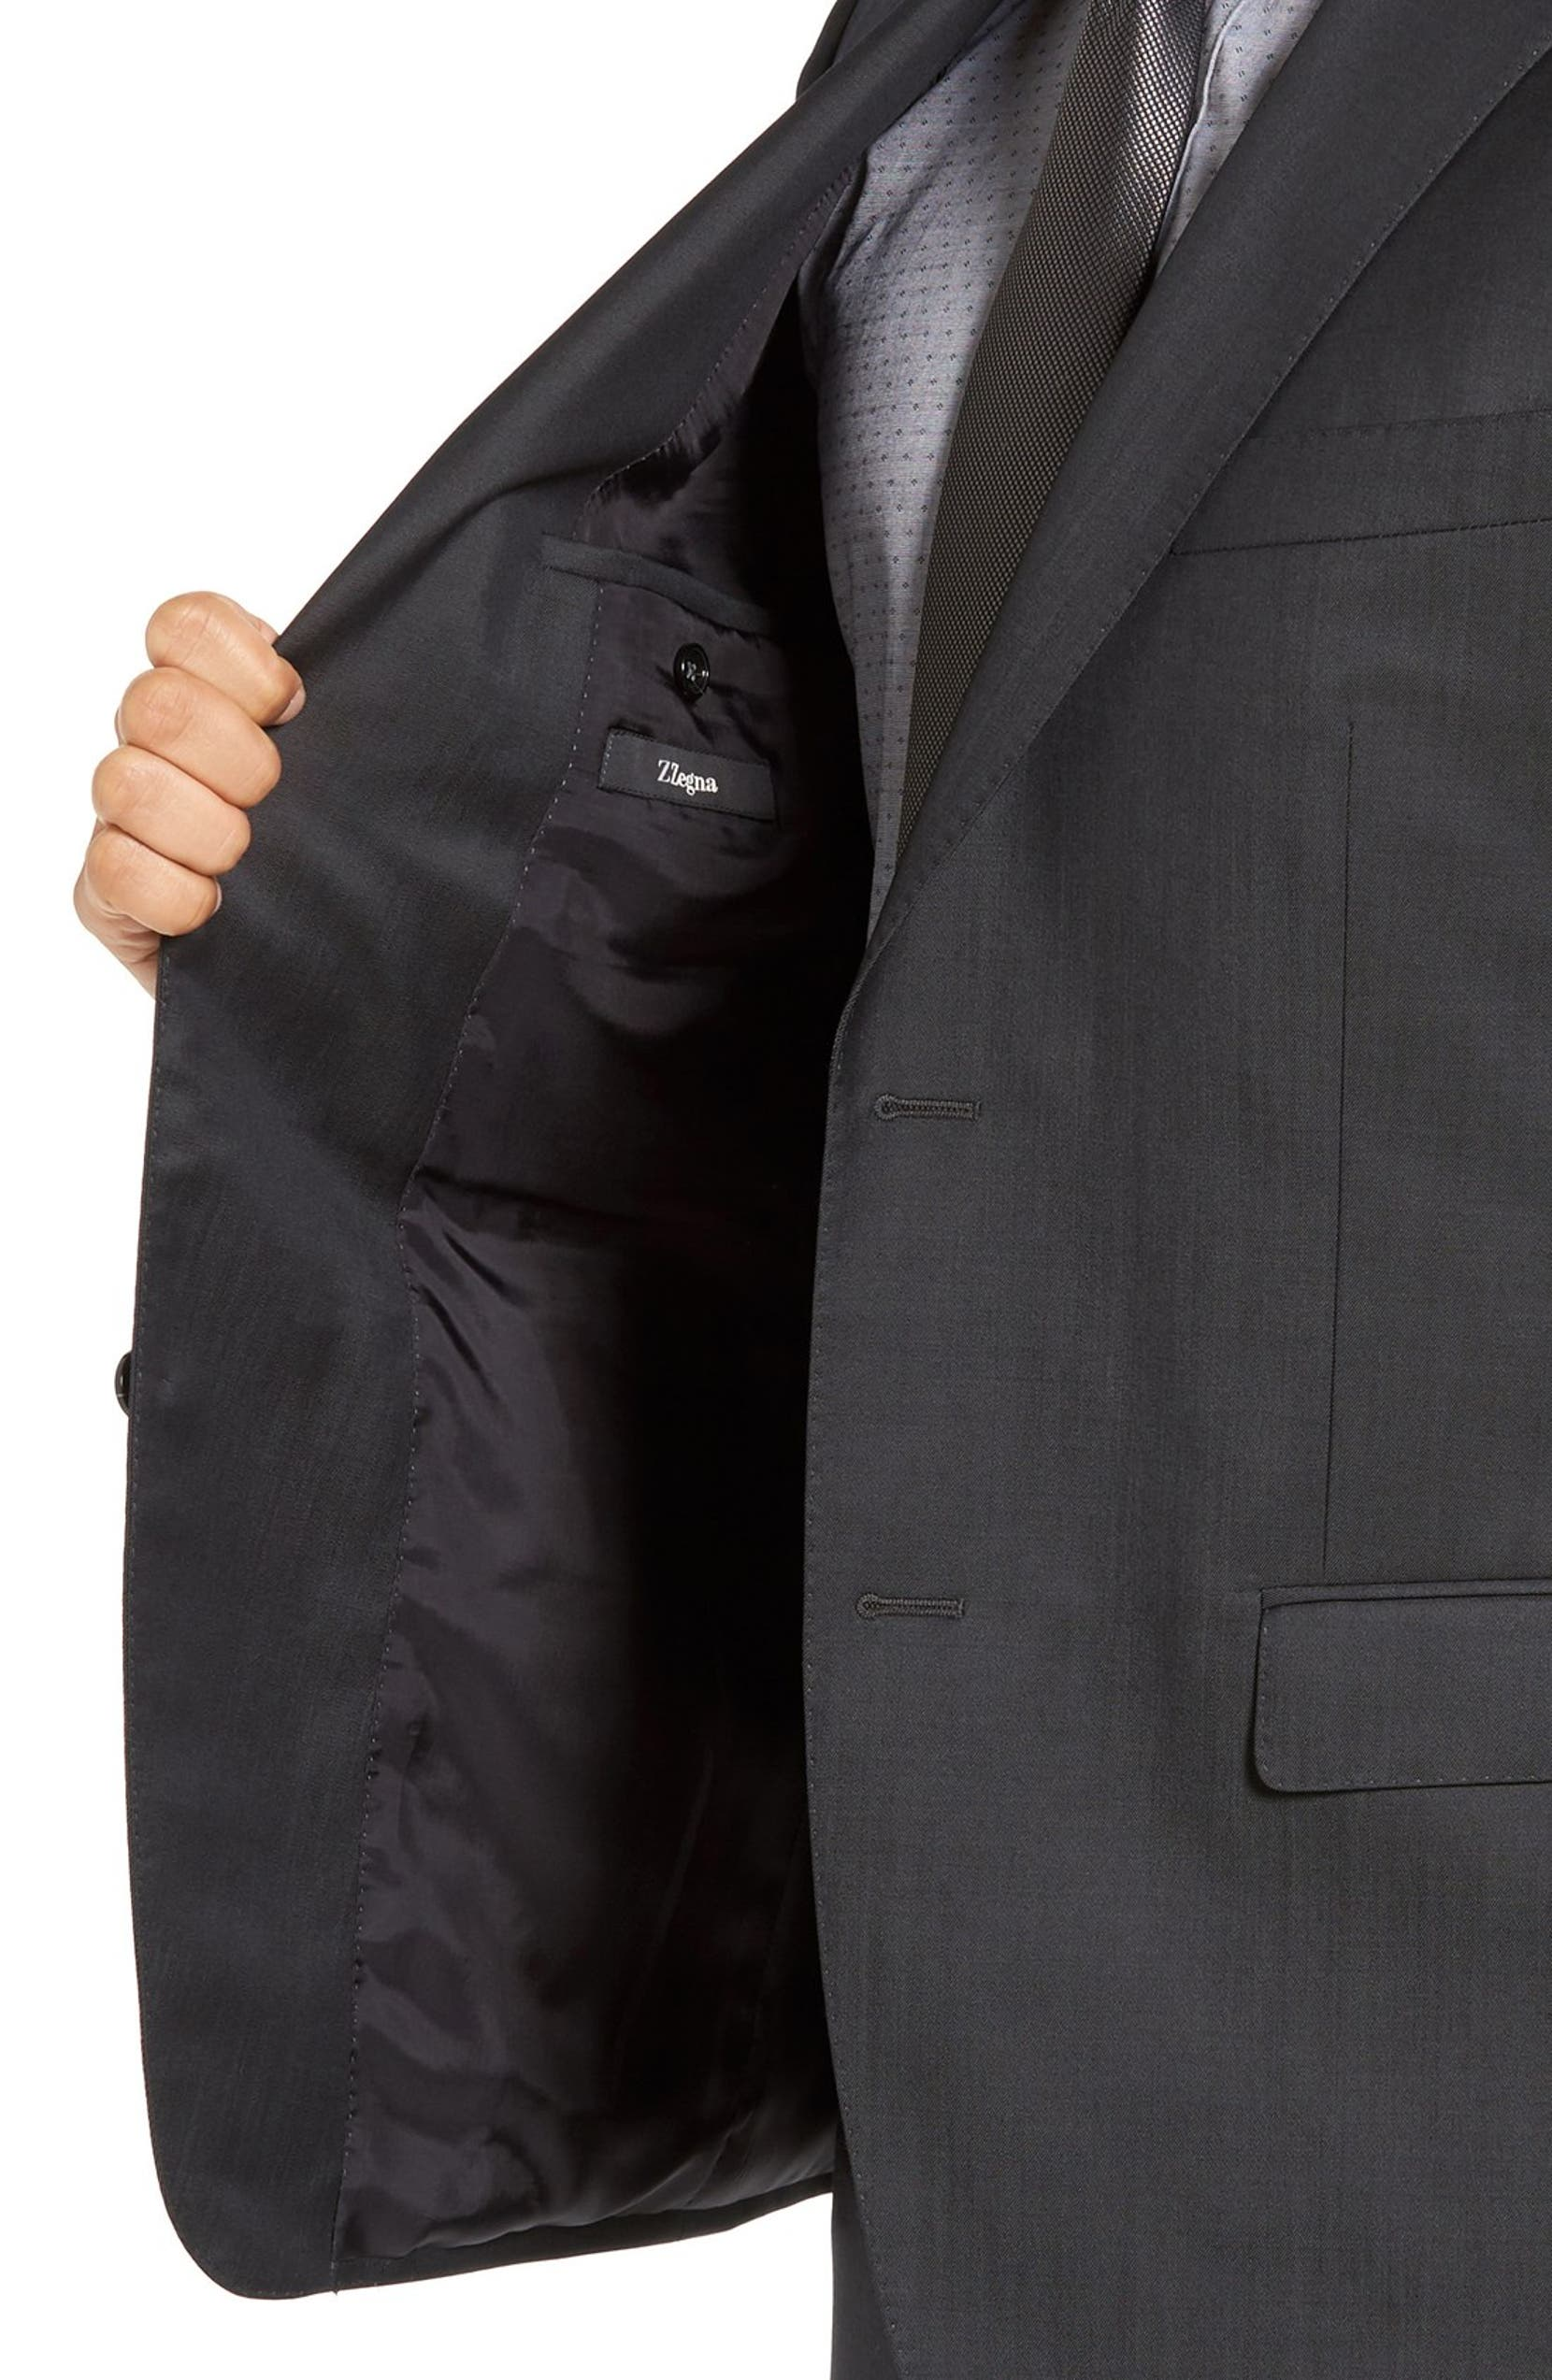 069b5e5cfe6d2 Z Zegna Trim Fit Solid Wool Suit   Nordstrom